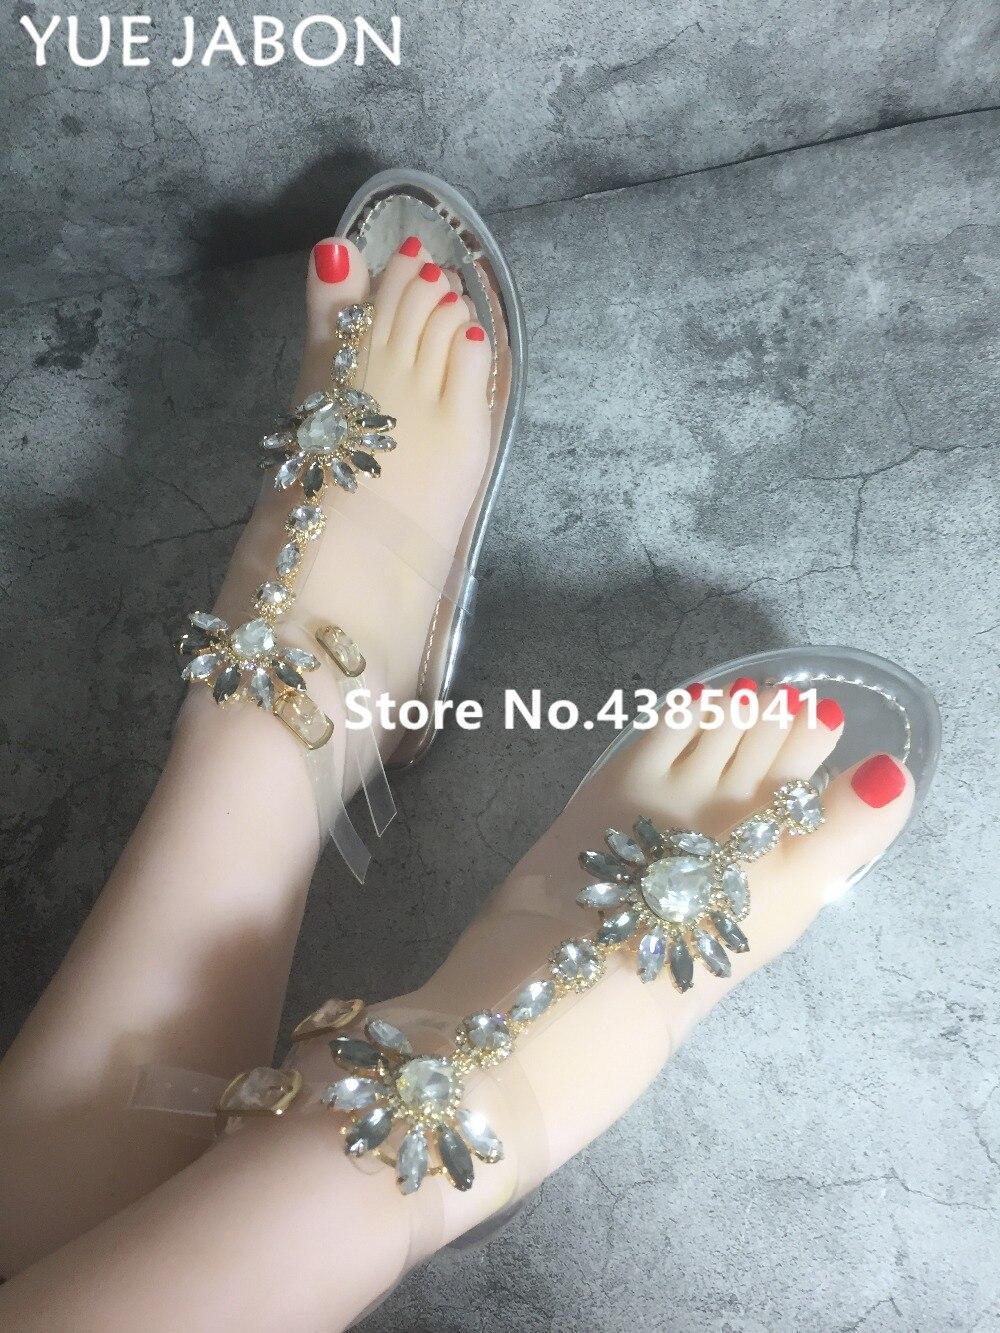 HTB1oWnTjf6TBKNjSZJiq6zKVFXav 2019 Woman Sandals Women Shoes Rhinestones Gladiator Flat Sandals Crystal Chaussure Plus Size 43 tenis feminino Green Flip Flops